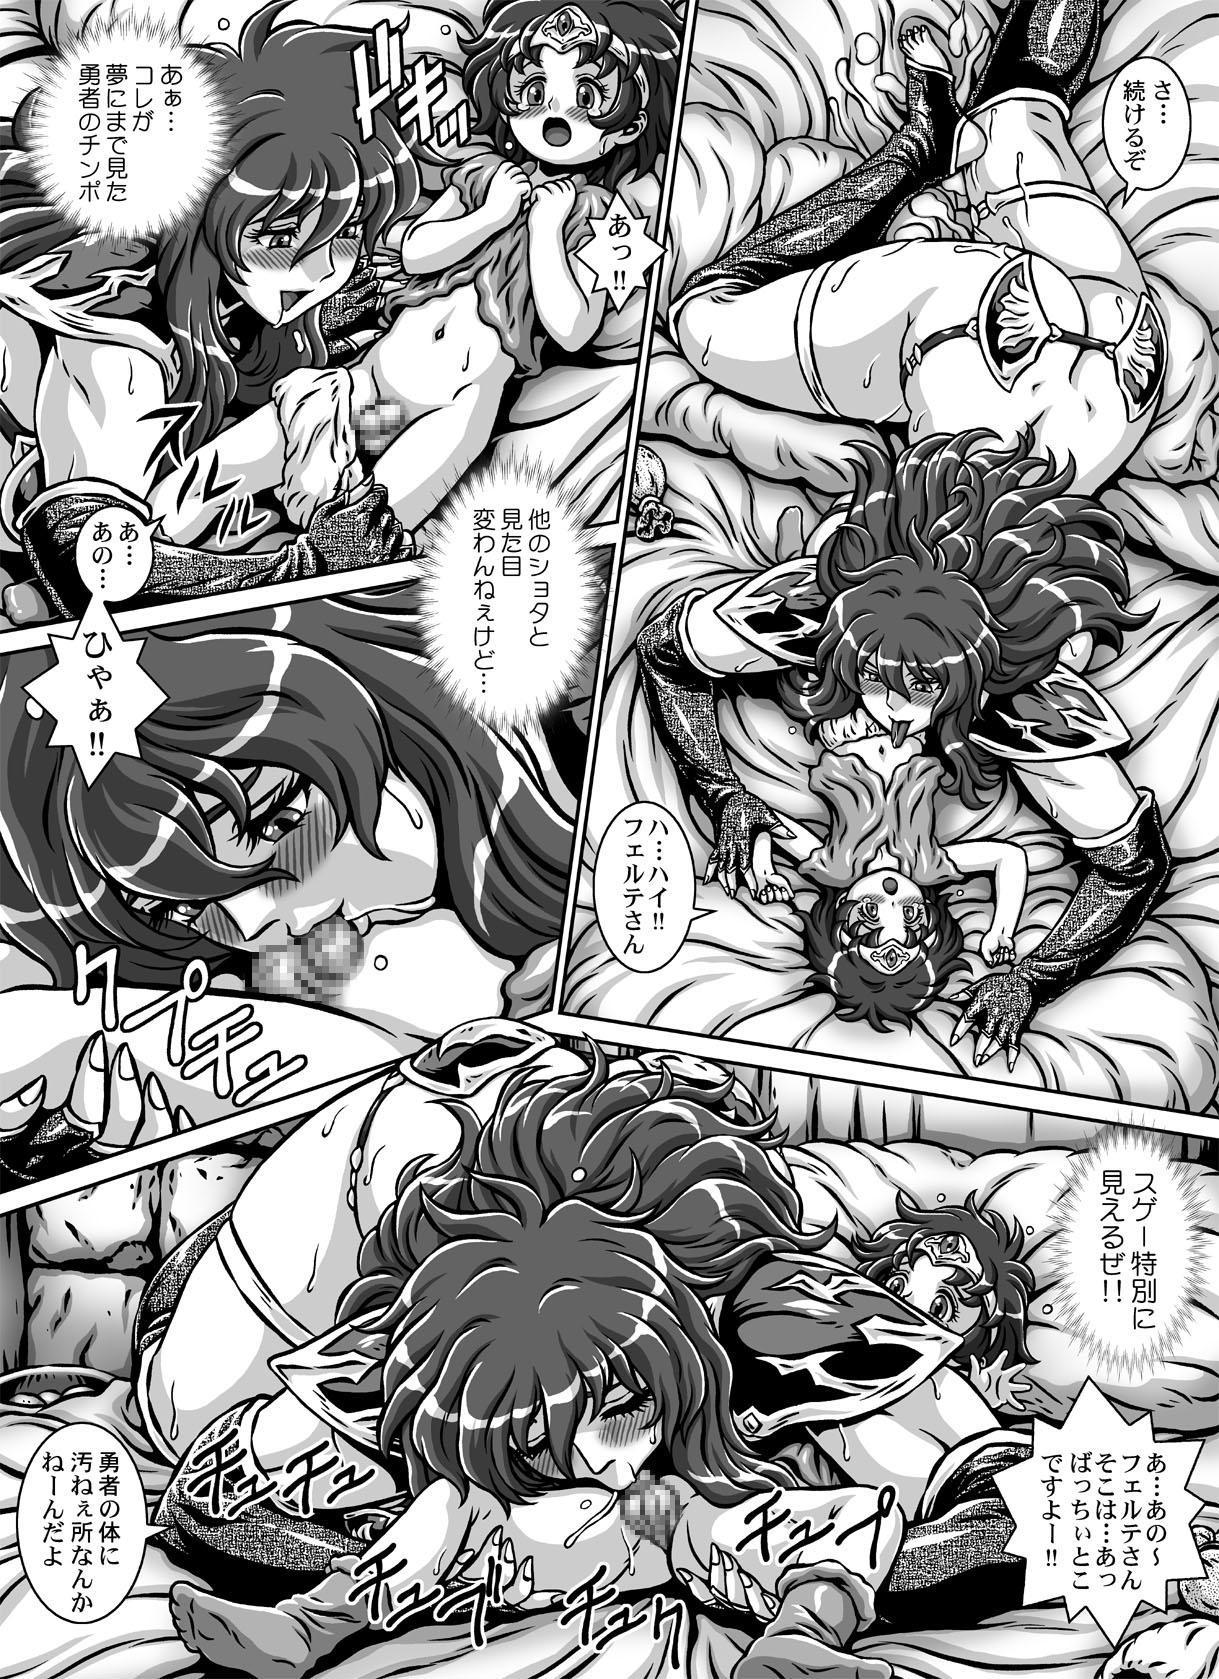 [Naginata-kan (Matsurino Naginata)] D-Q-R ~PROOF OF THE HERO~ (Dragon Quest III) [Digital] 35